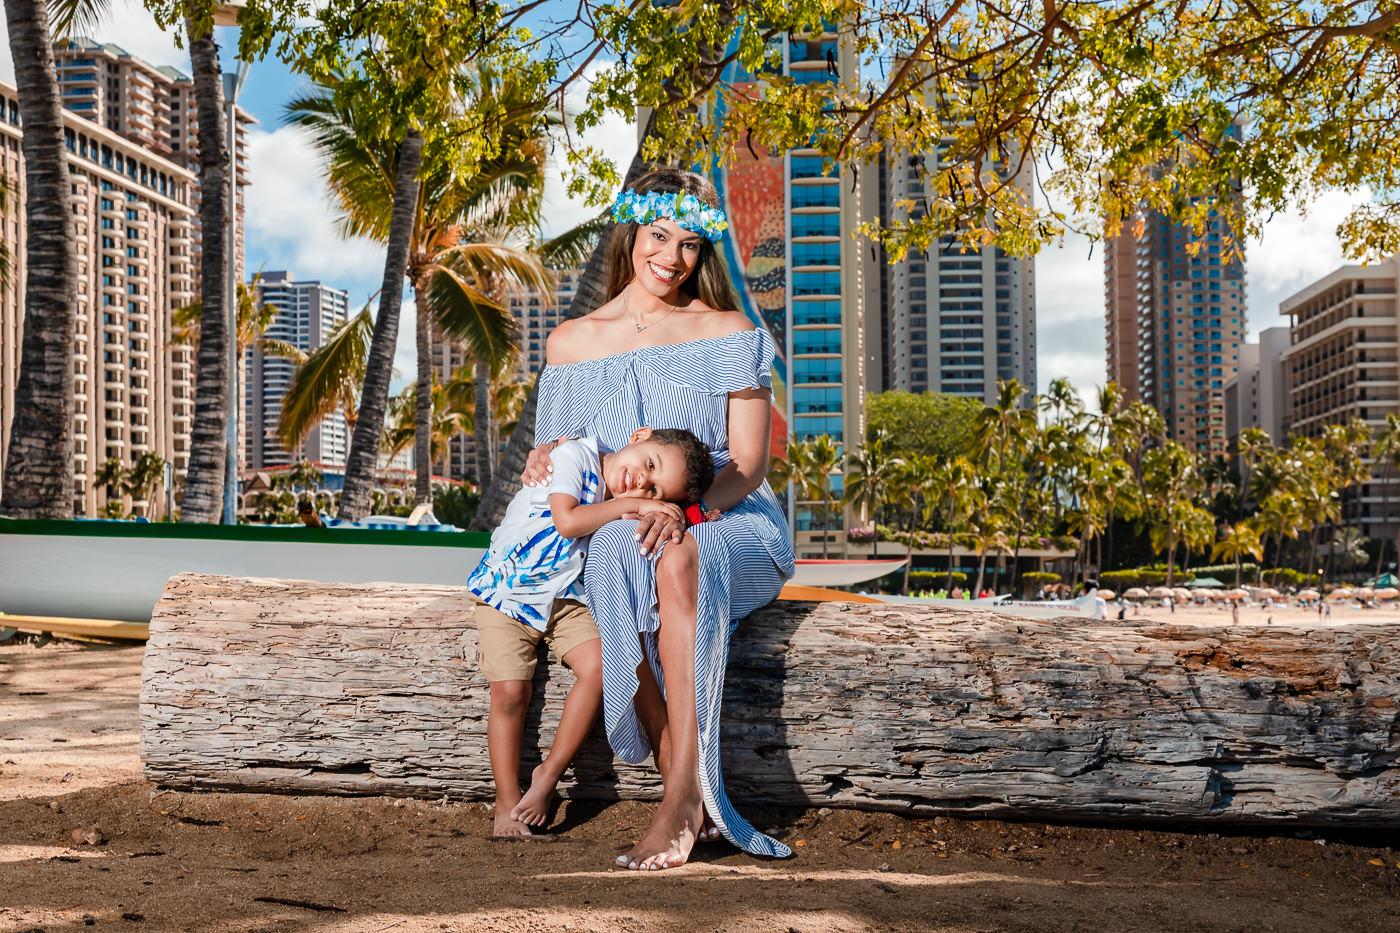 Oahu2019-3066.jpg